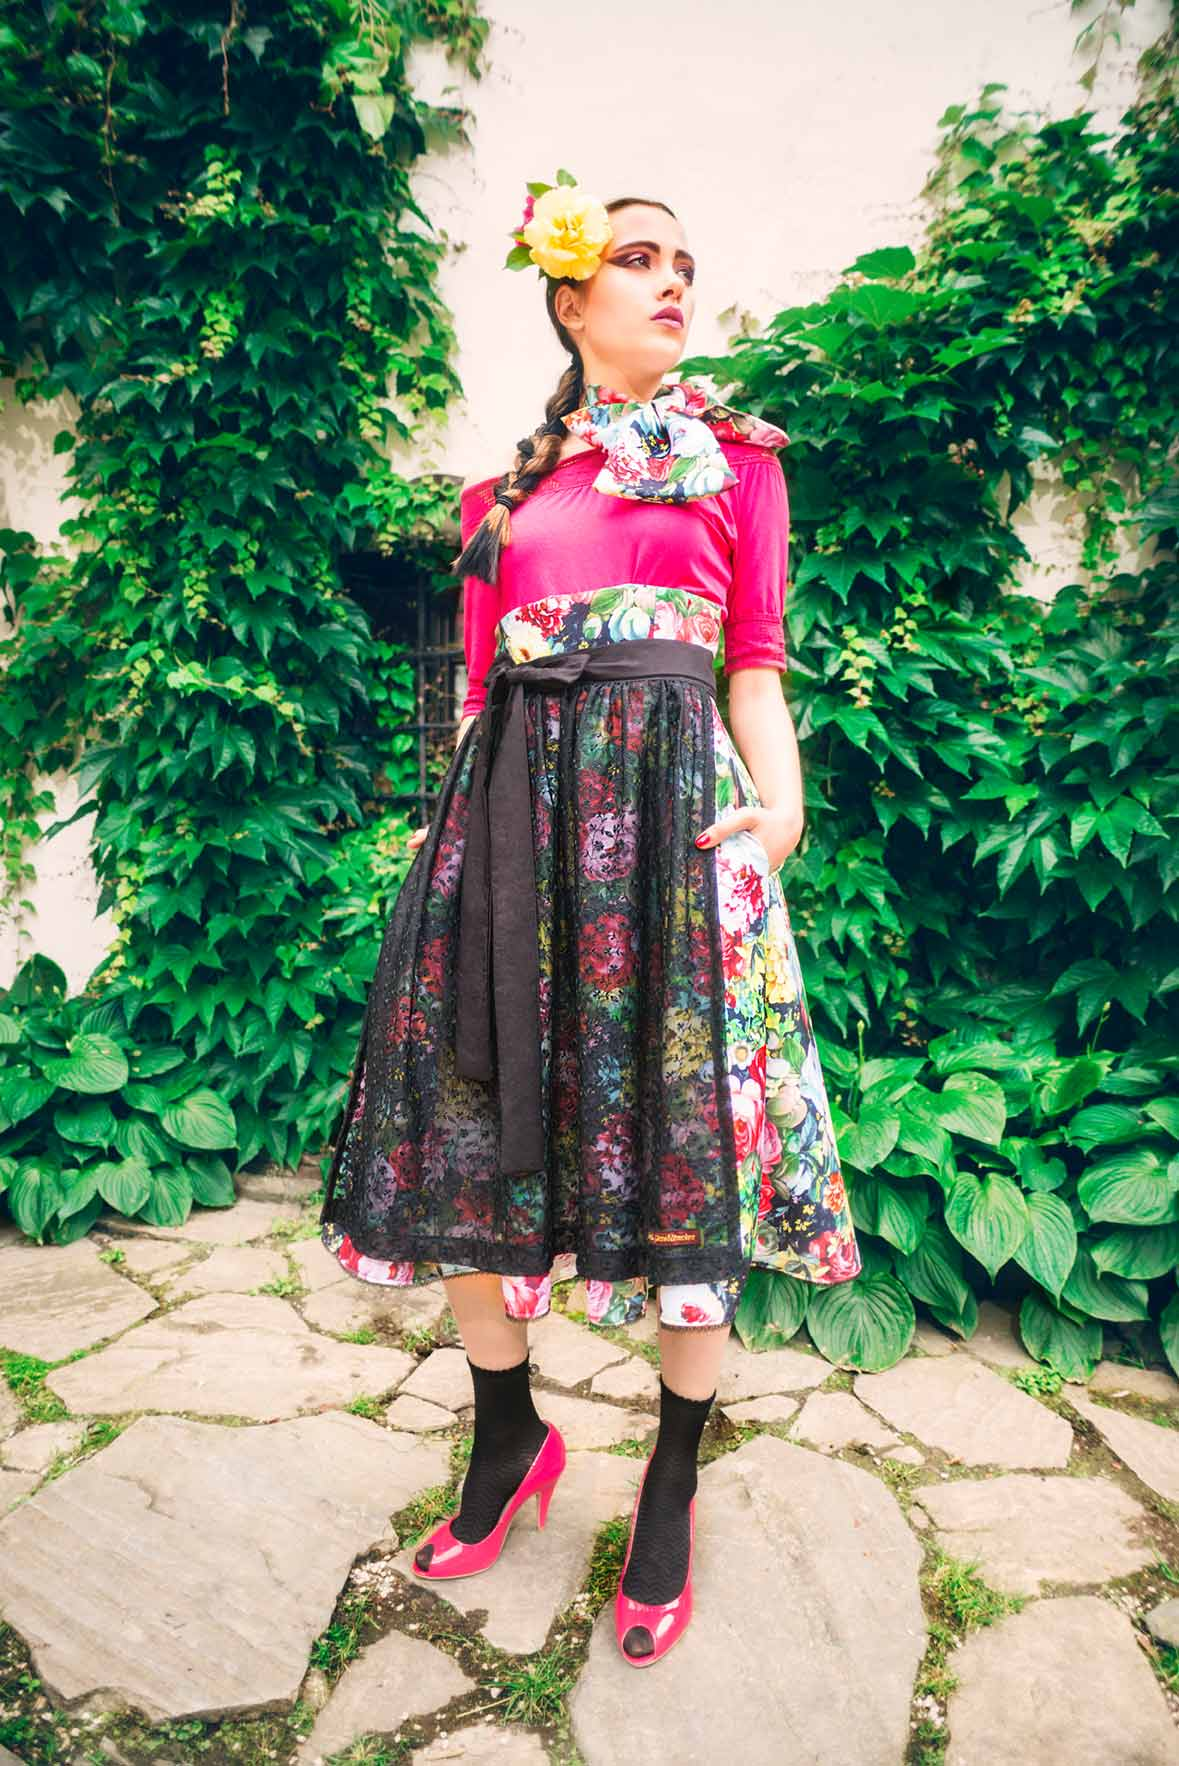 CB_Ga¦ênsebluemchen_Gruenschnabel_Frida_Kahlo_001